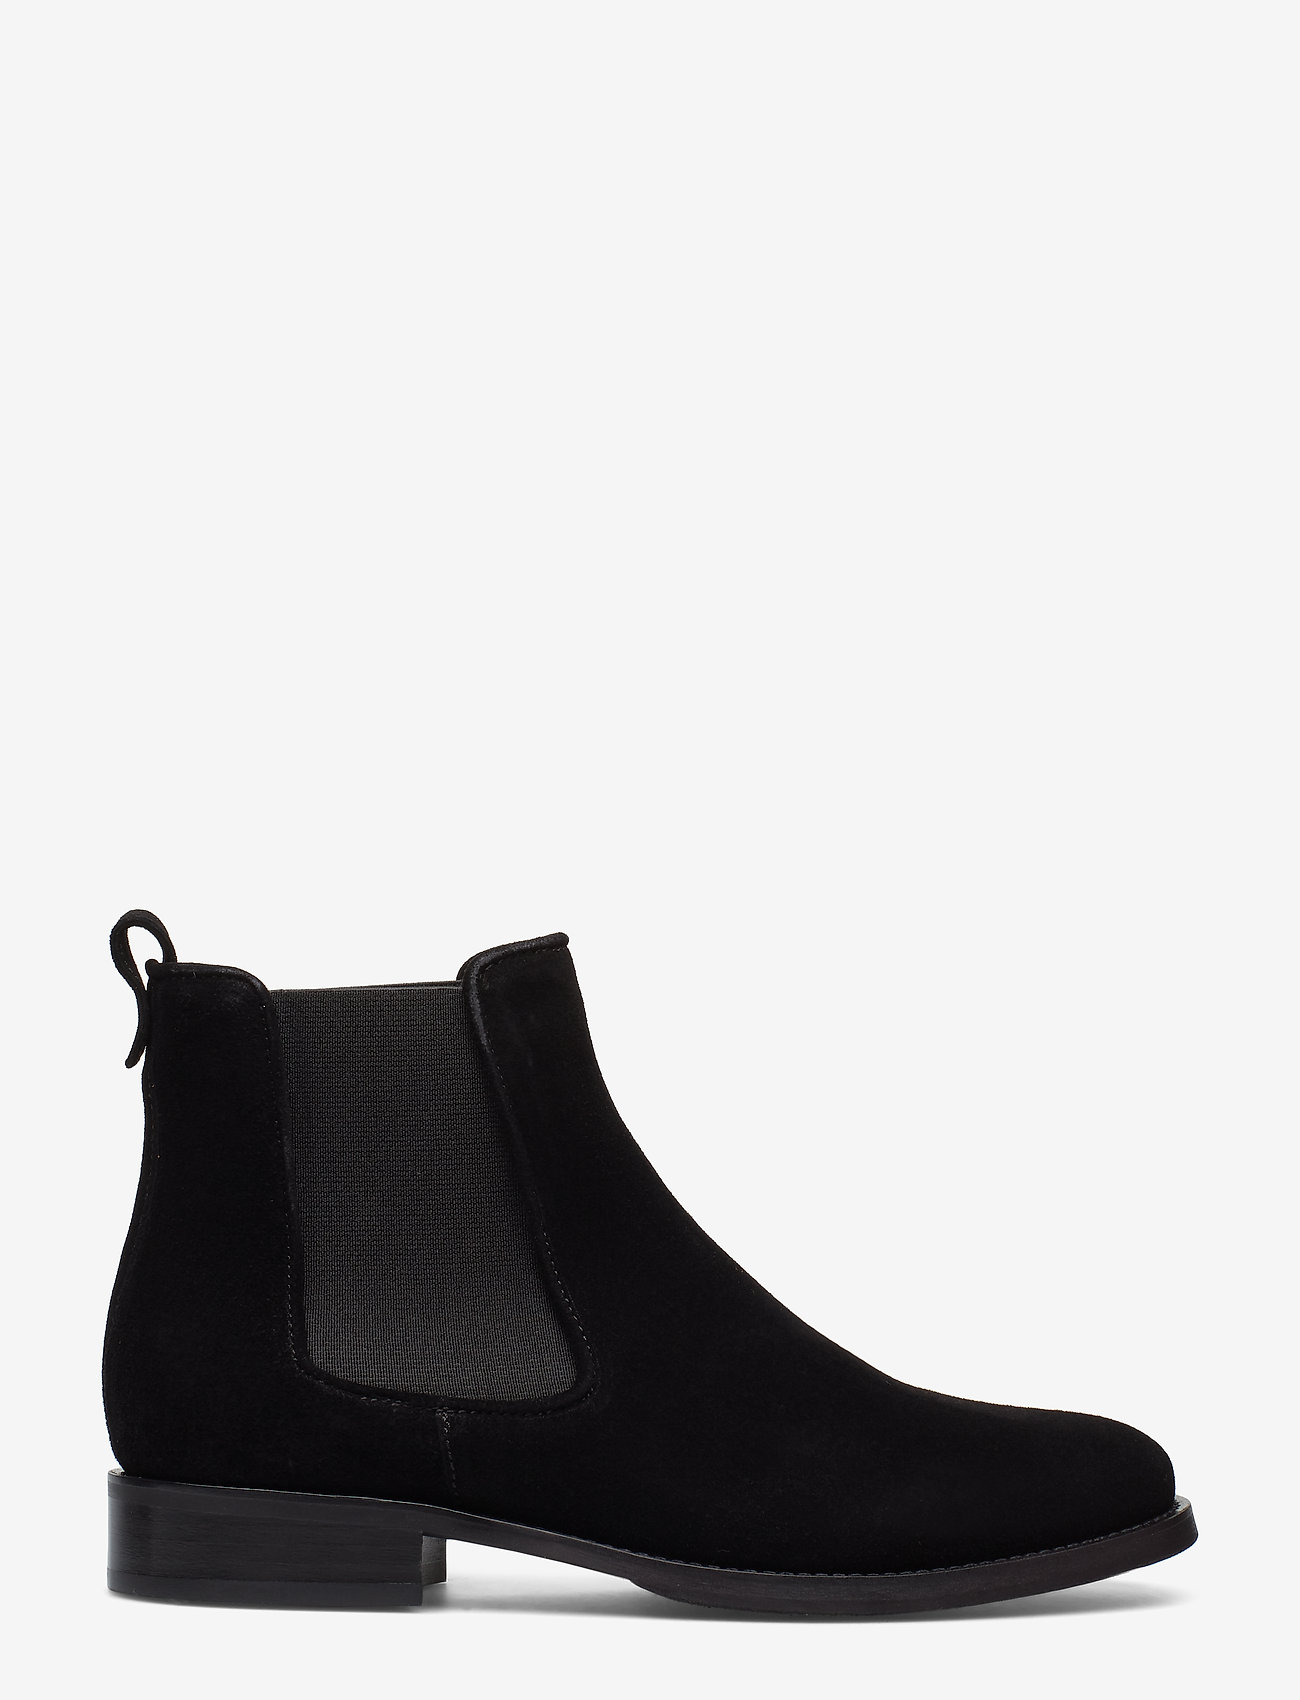 Billi Bi - Boots 7913 - chelsea boots - black suede 50 p